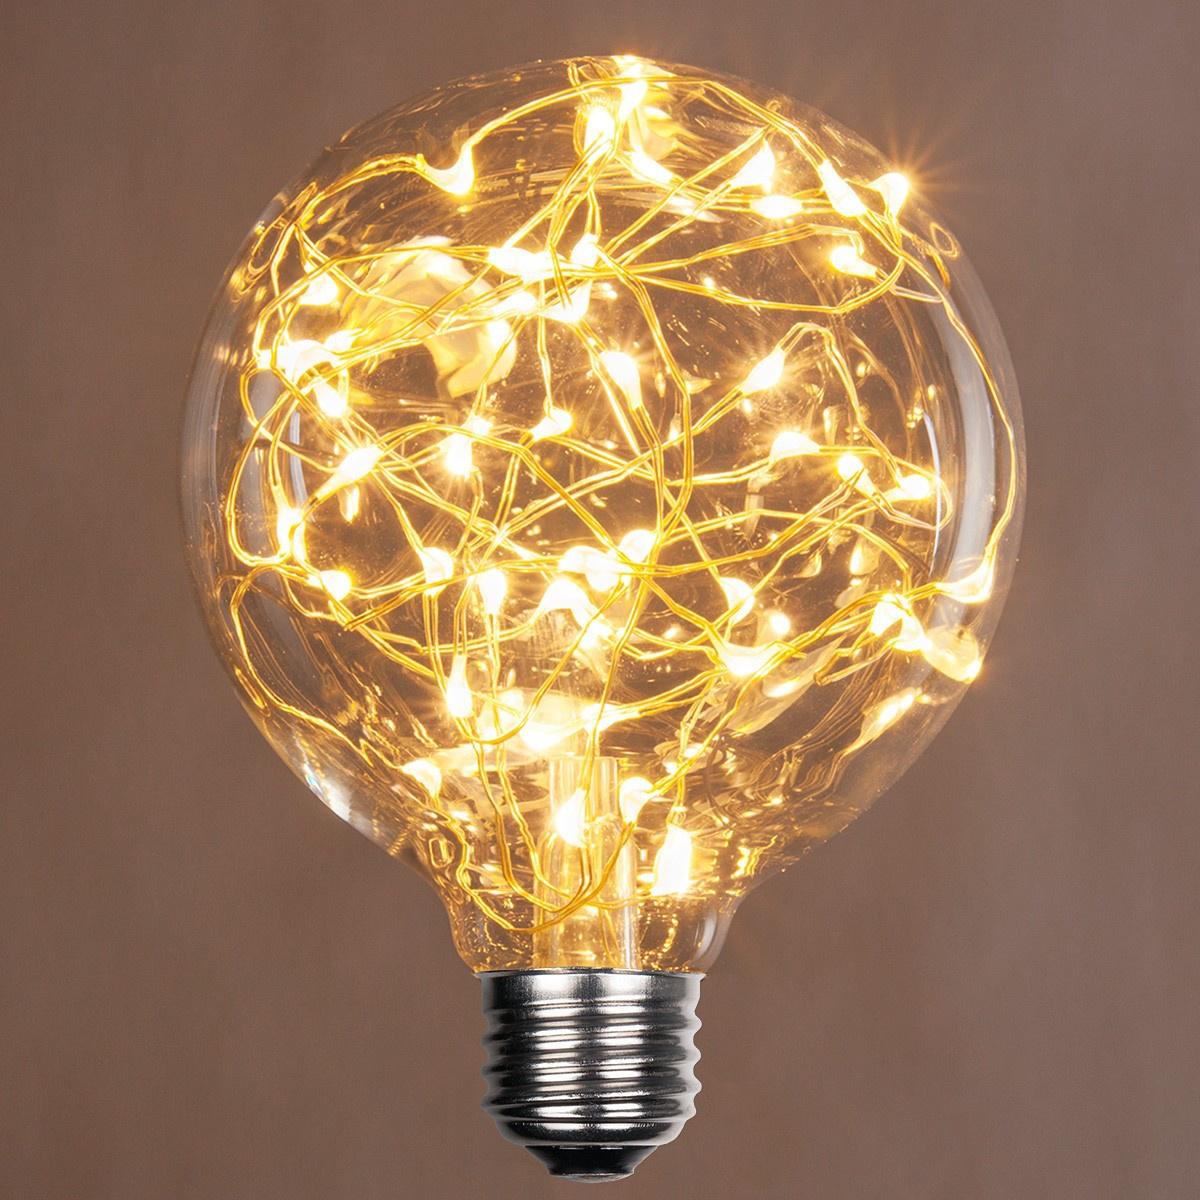 How Get Free Led Light Bulbs